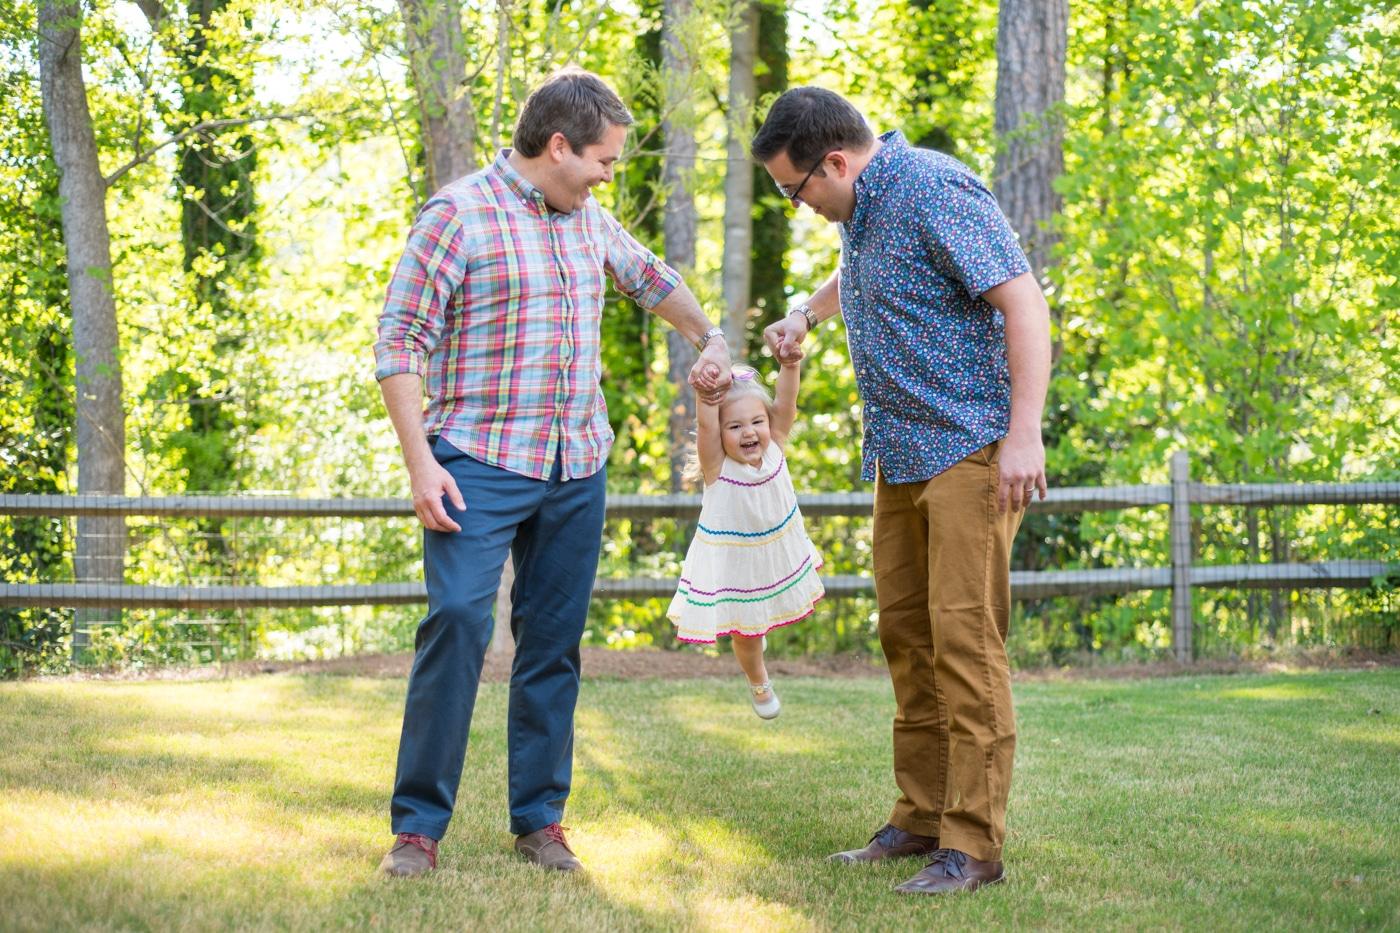 Dads swinging their toddler on a sunny day in Atlanta GA Raven Shutley Studios family photos